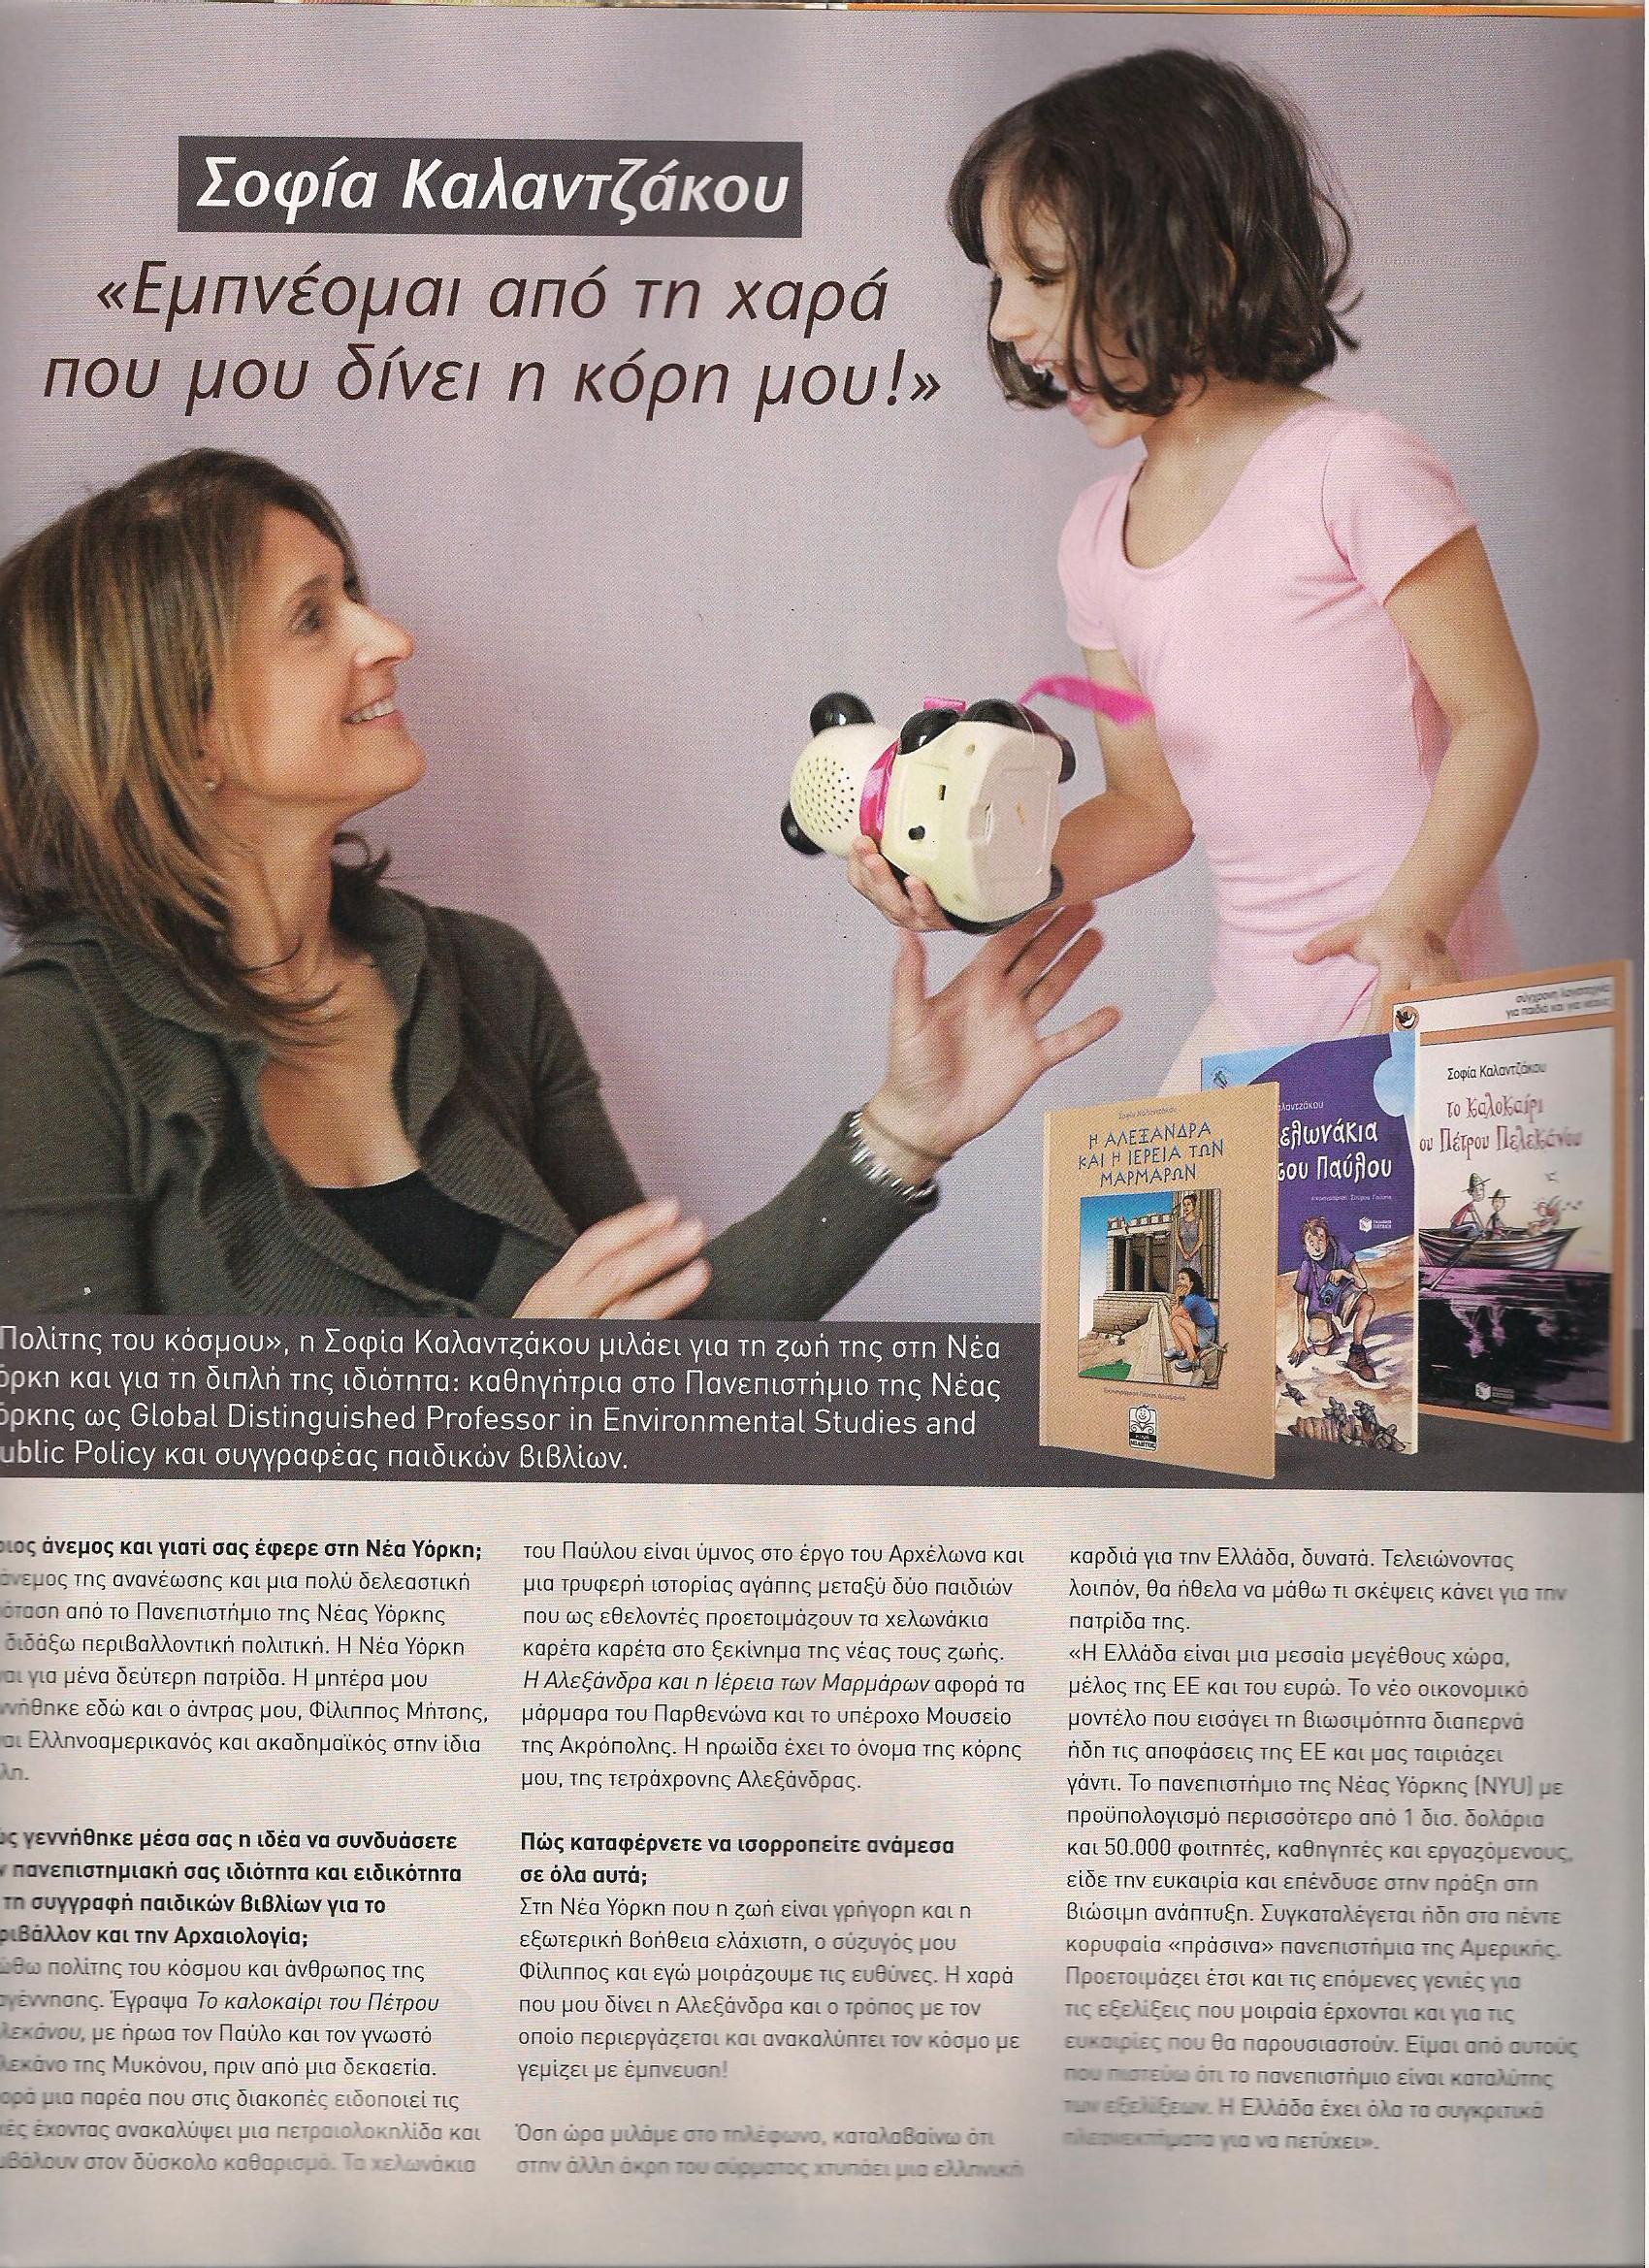 March 2011 interview OK magazine Greece